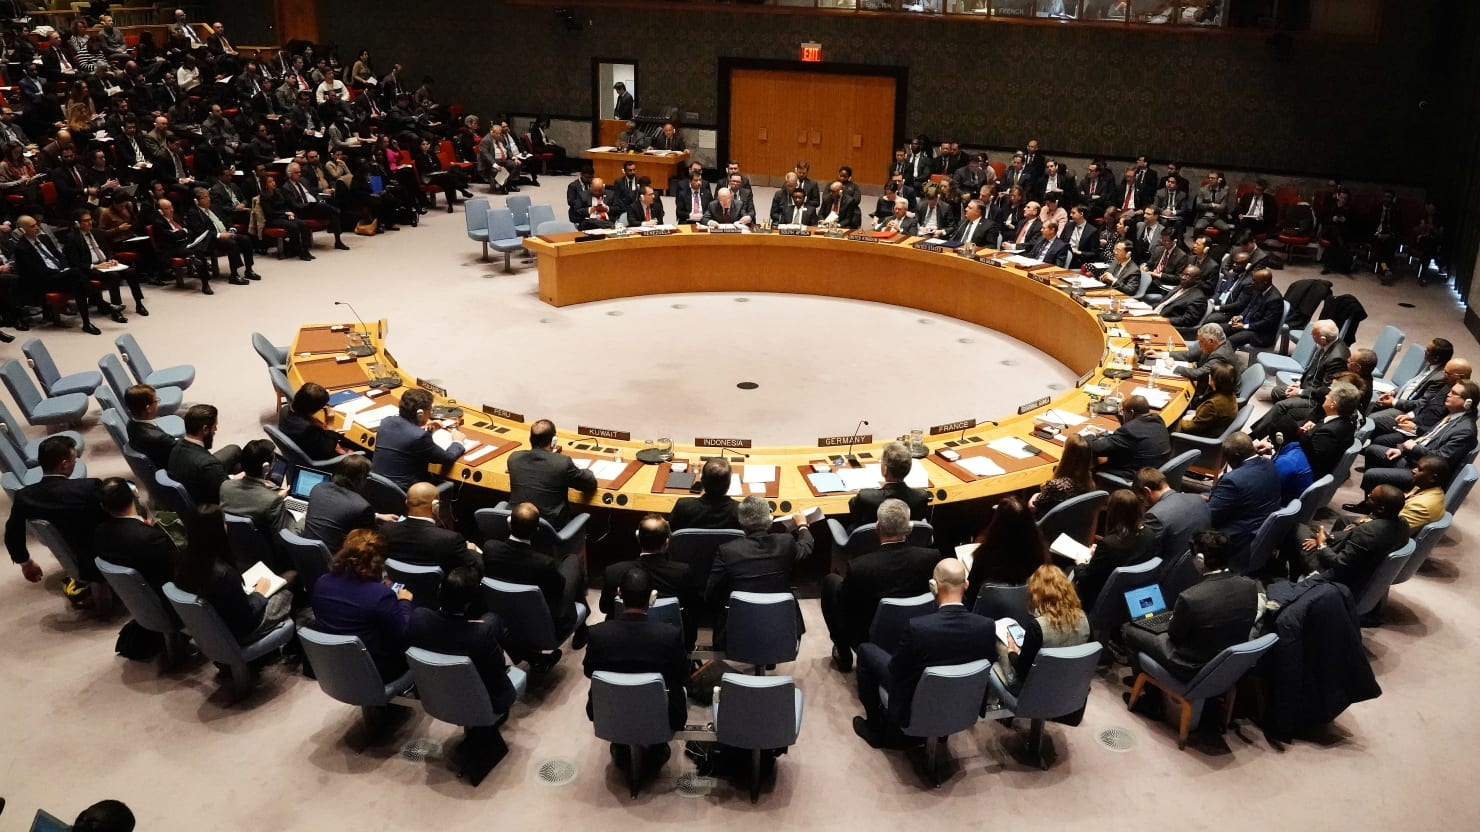 U.S. Threatening to Veto U.N. Resolution Against Rape as Weapon of War